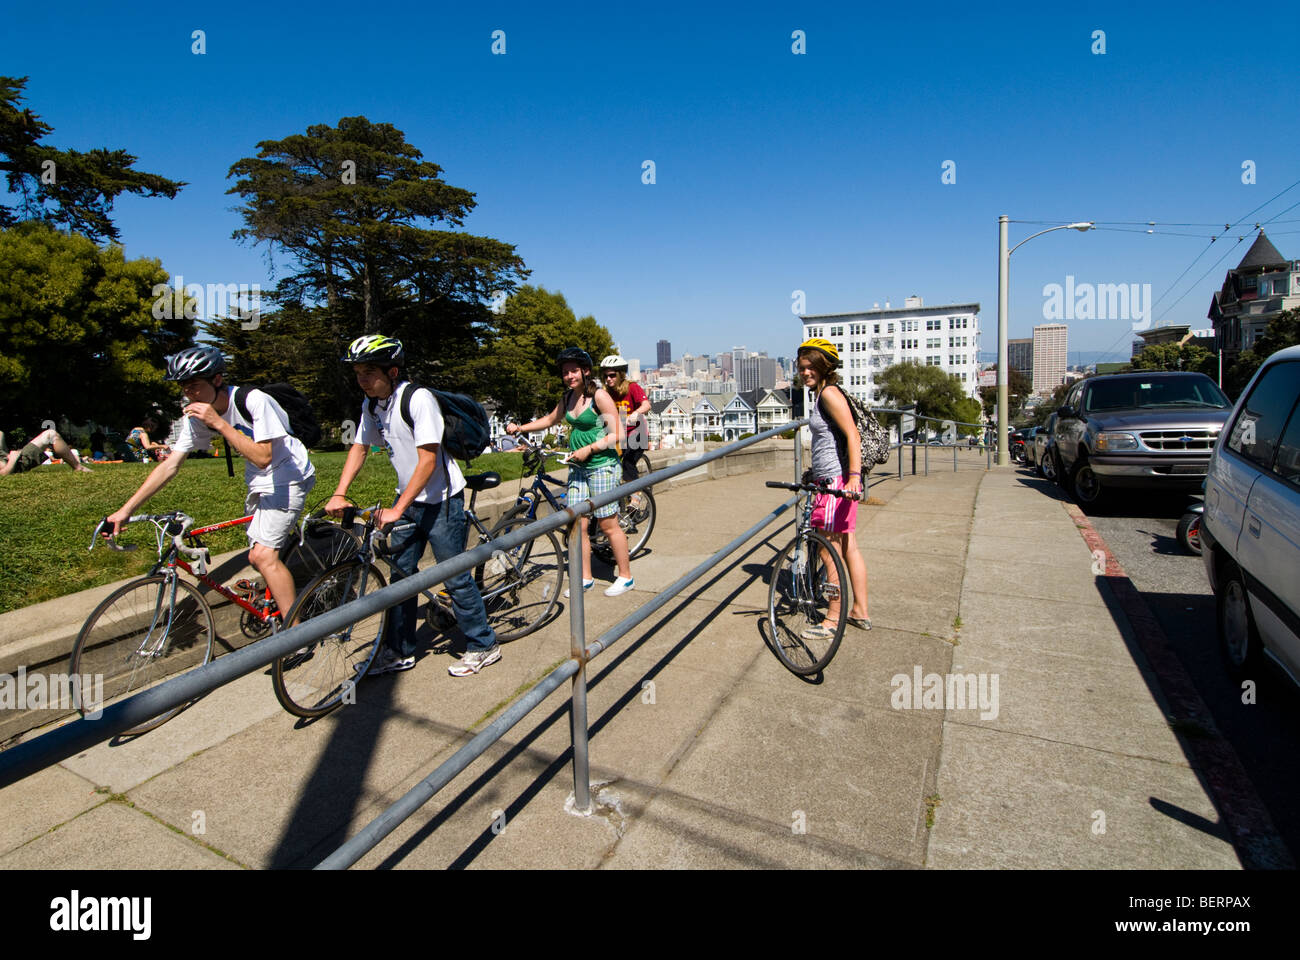 San Francisco Bicyclists at Alamo Square. Photo copyright Lee Foster.  Photo # 20-casanf79126 - Stock Image